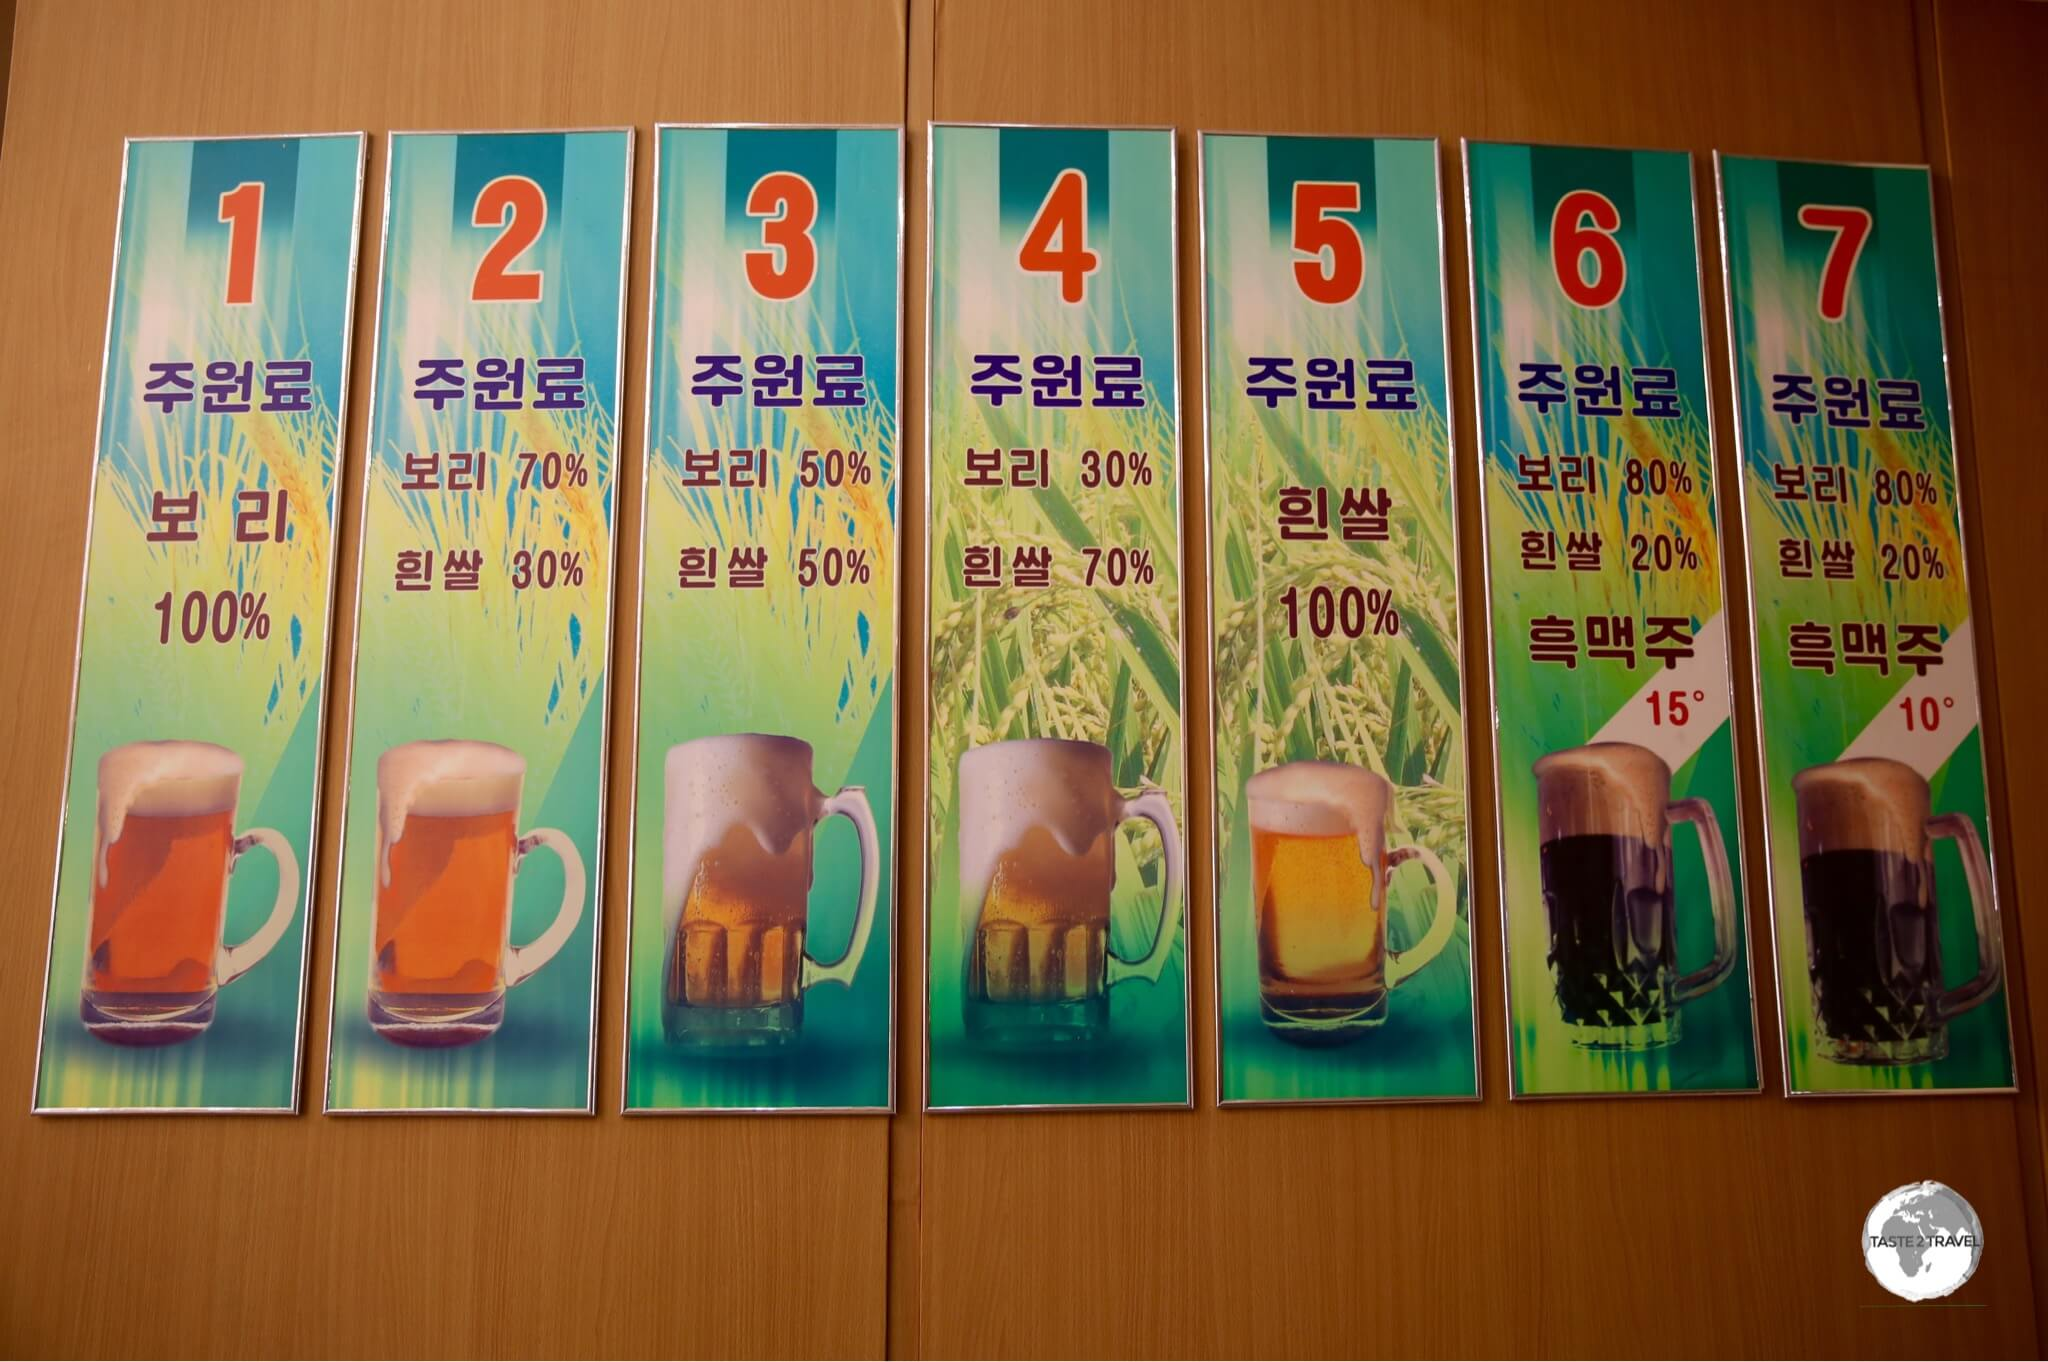 Beer selection at Taedonggang Brewery #3 in Pyongyang.